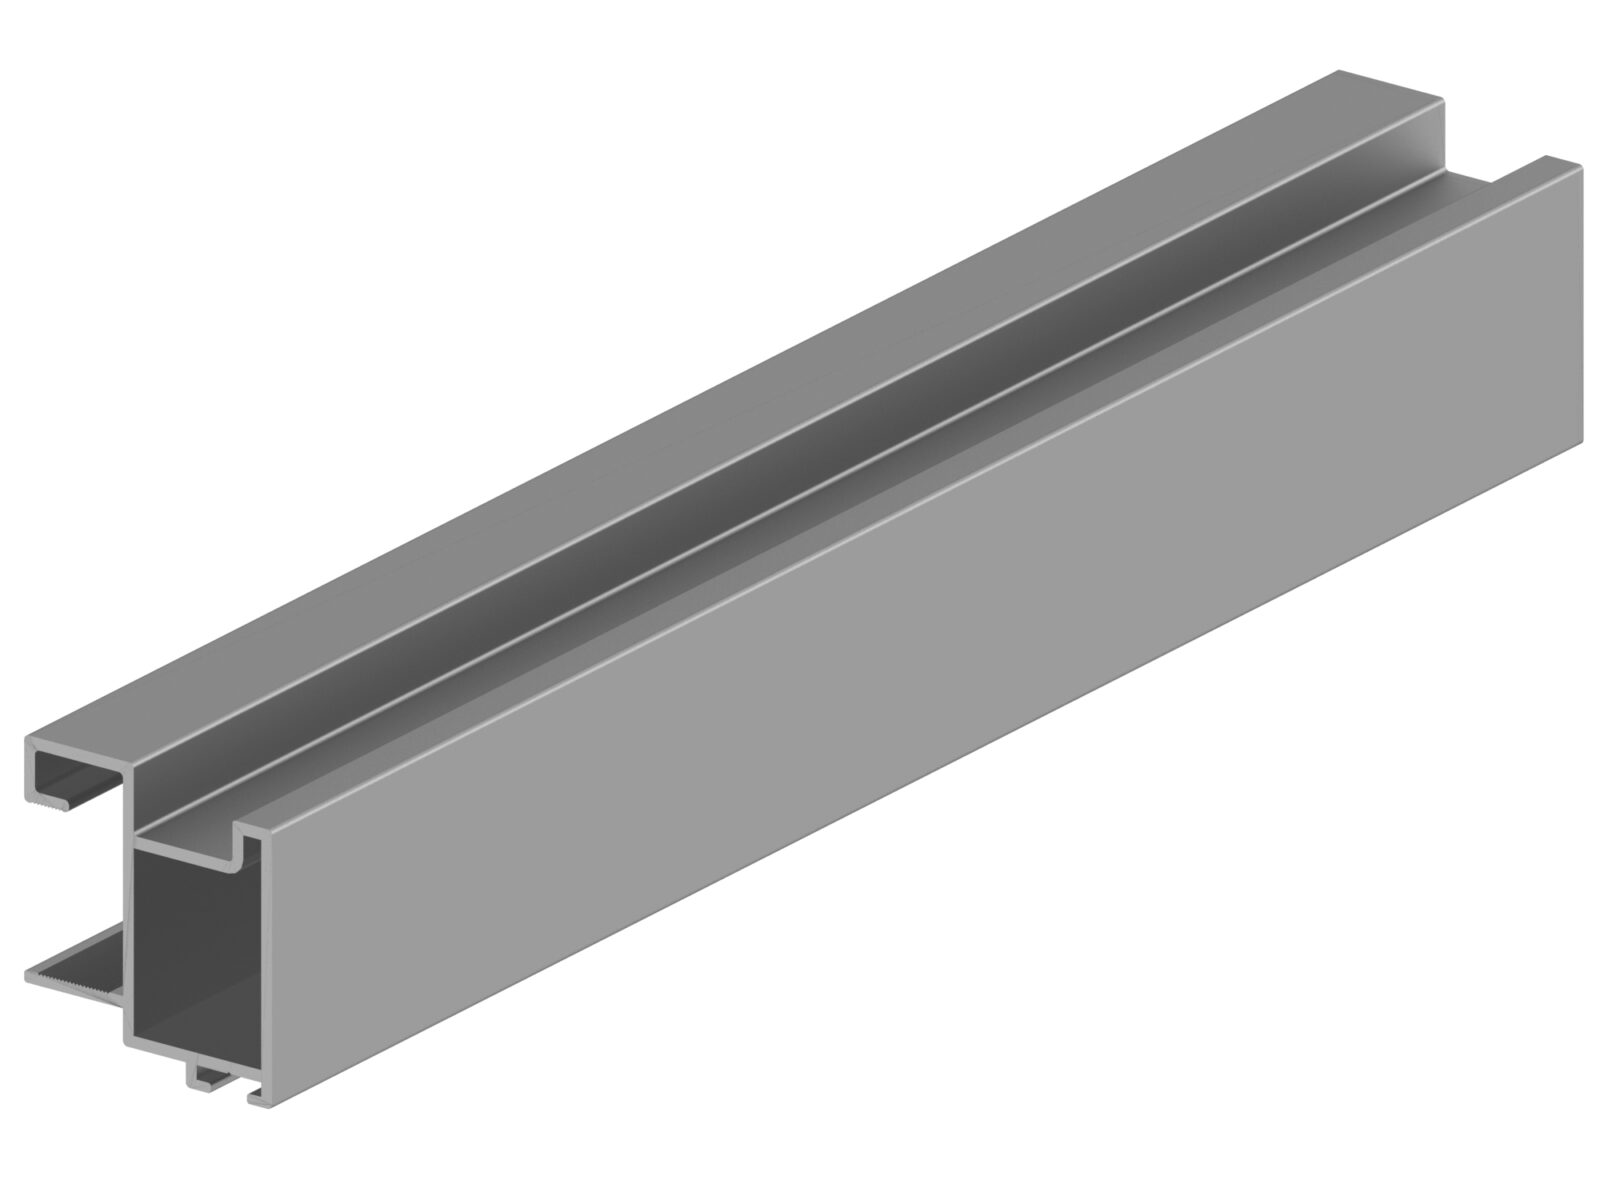 Kit puerta corredera armario acu a plata g80 cat logo - Kits puertas correderas armarios ...